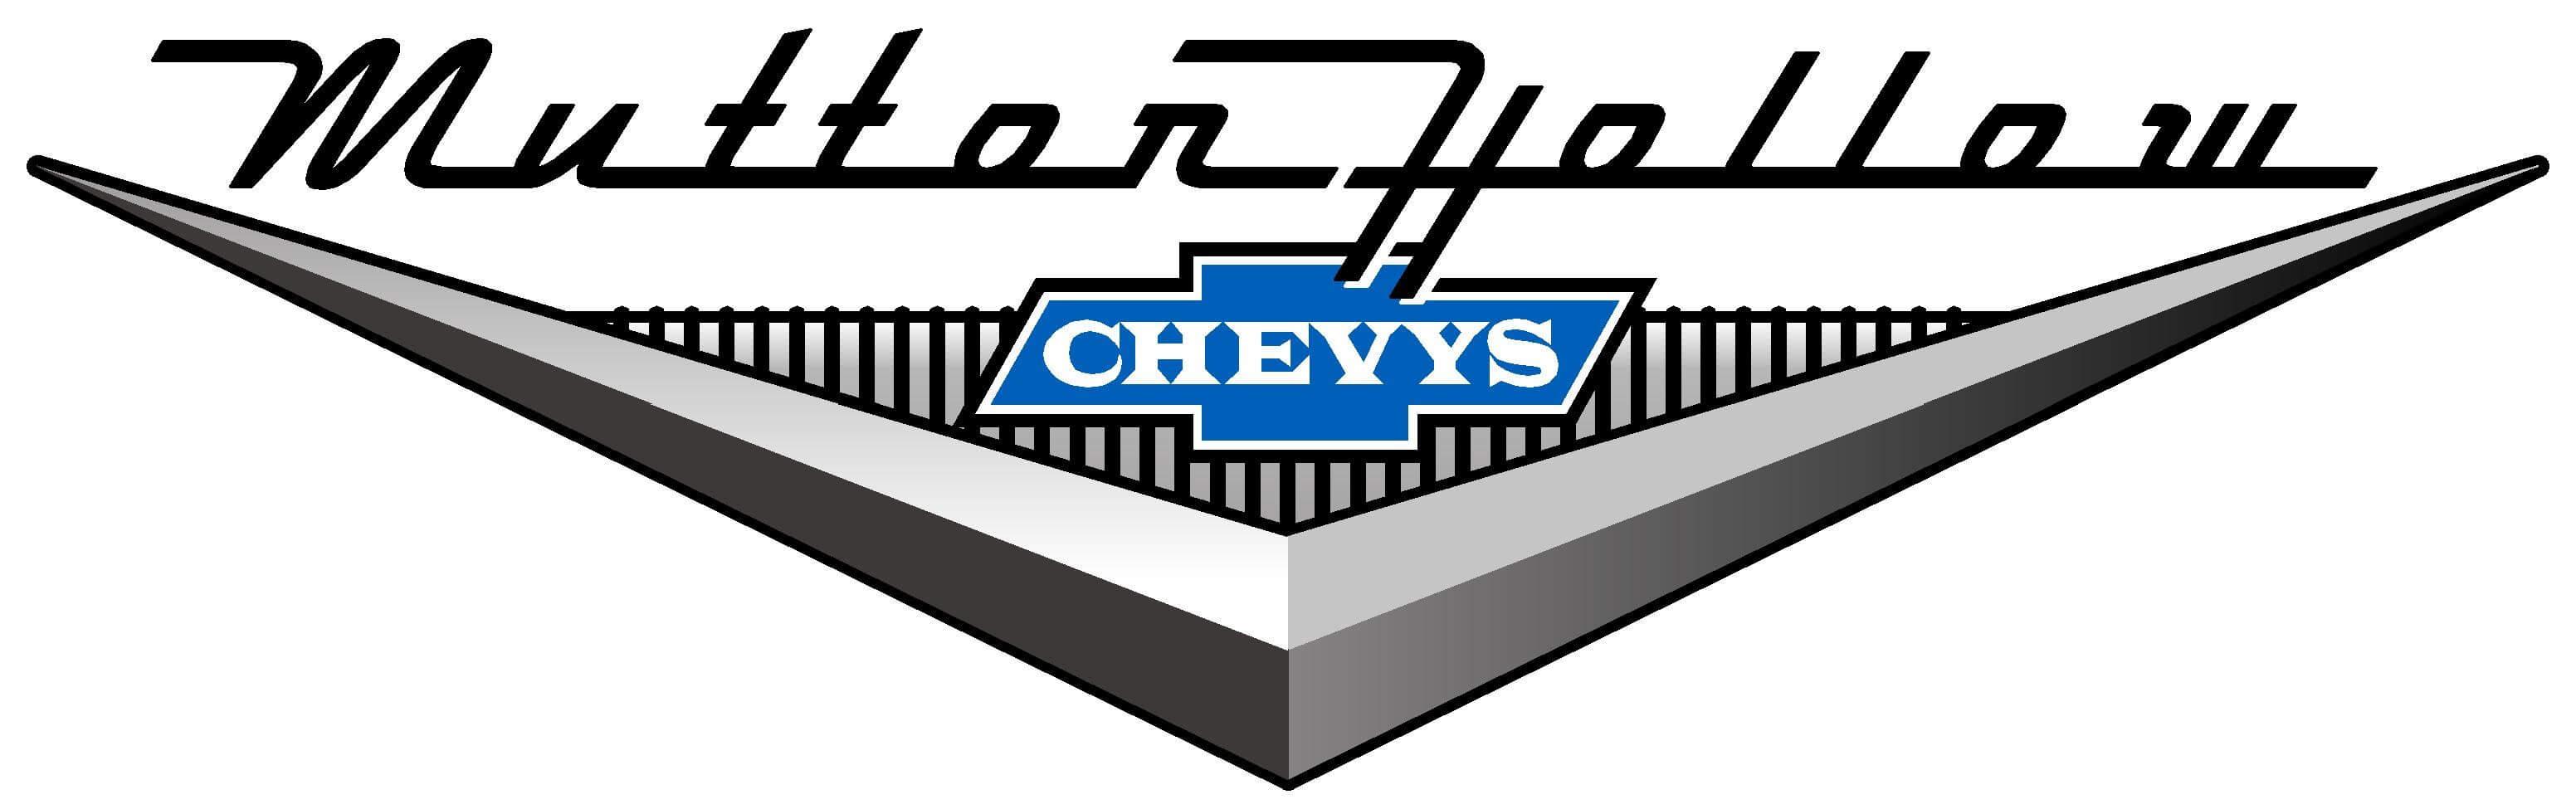 55-56 Chevy Tri Five Chrome Belair Rear Quarter Panel Script Emblem Badge New